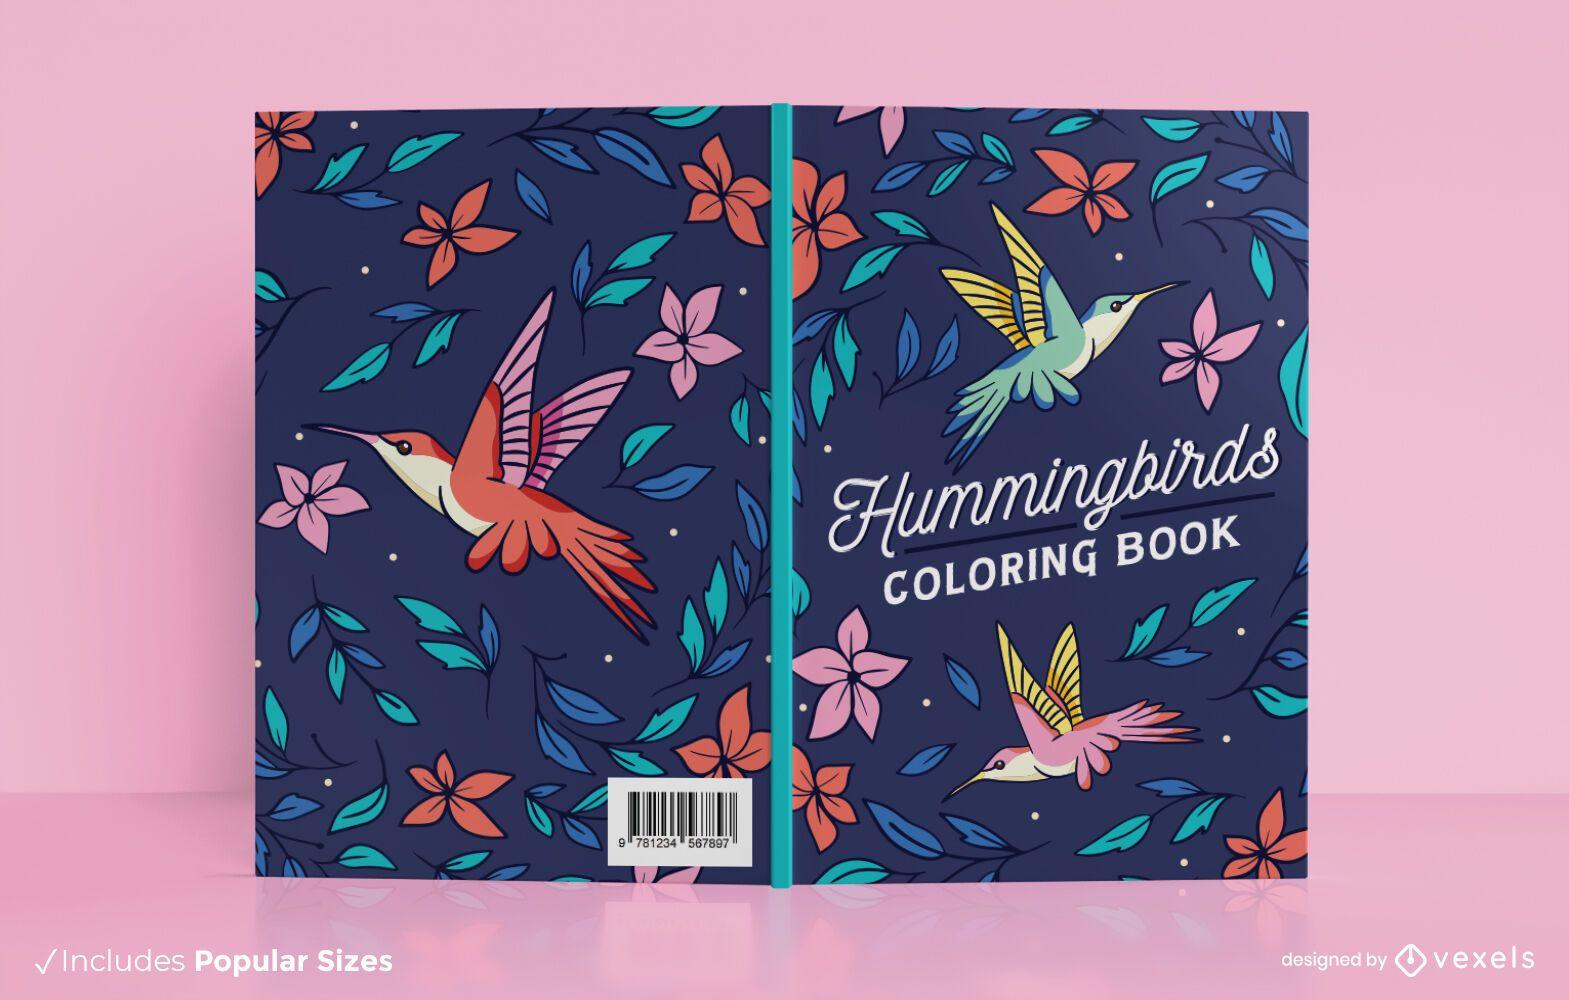 Hummingbirds book cover design